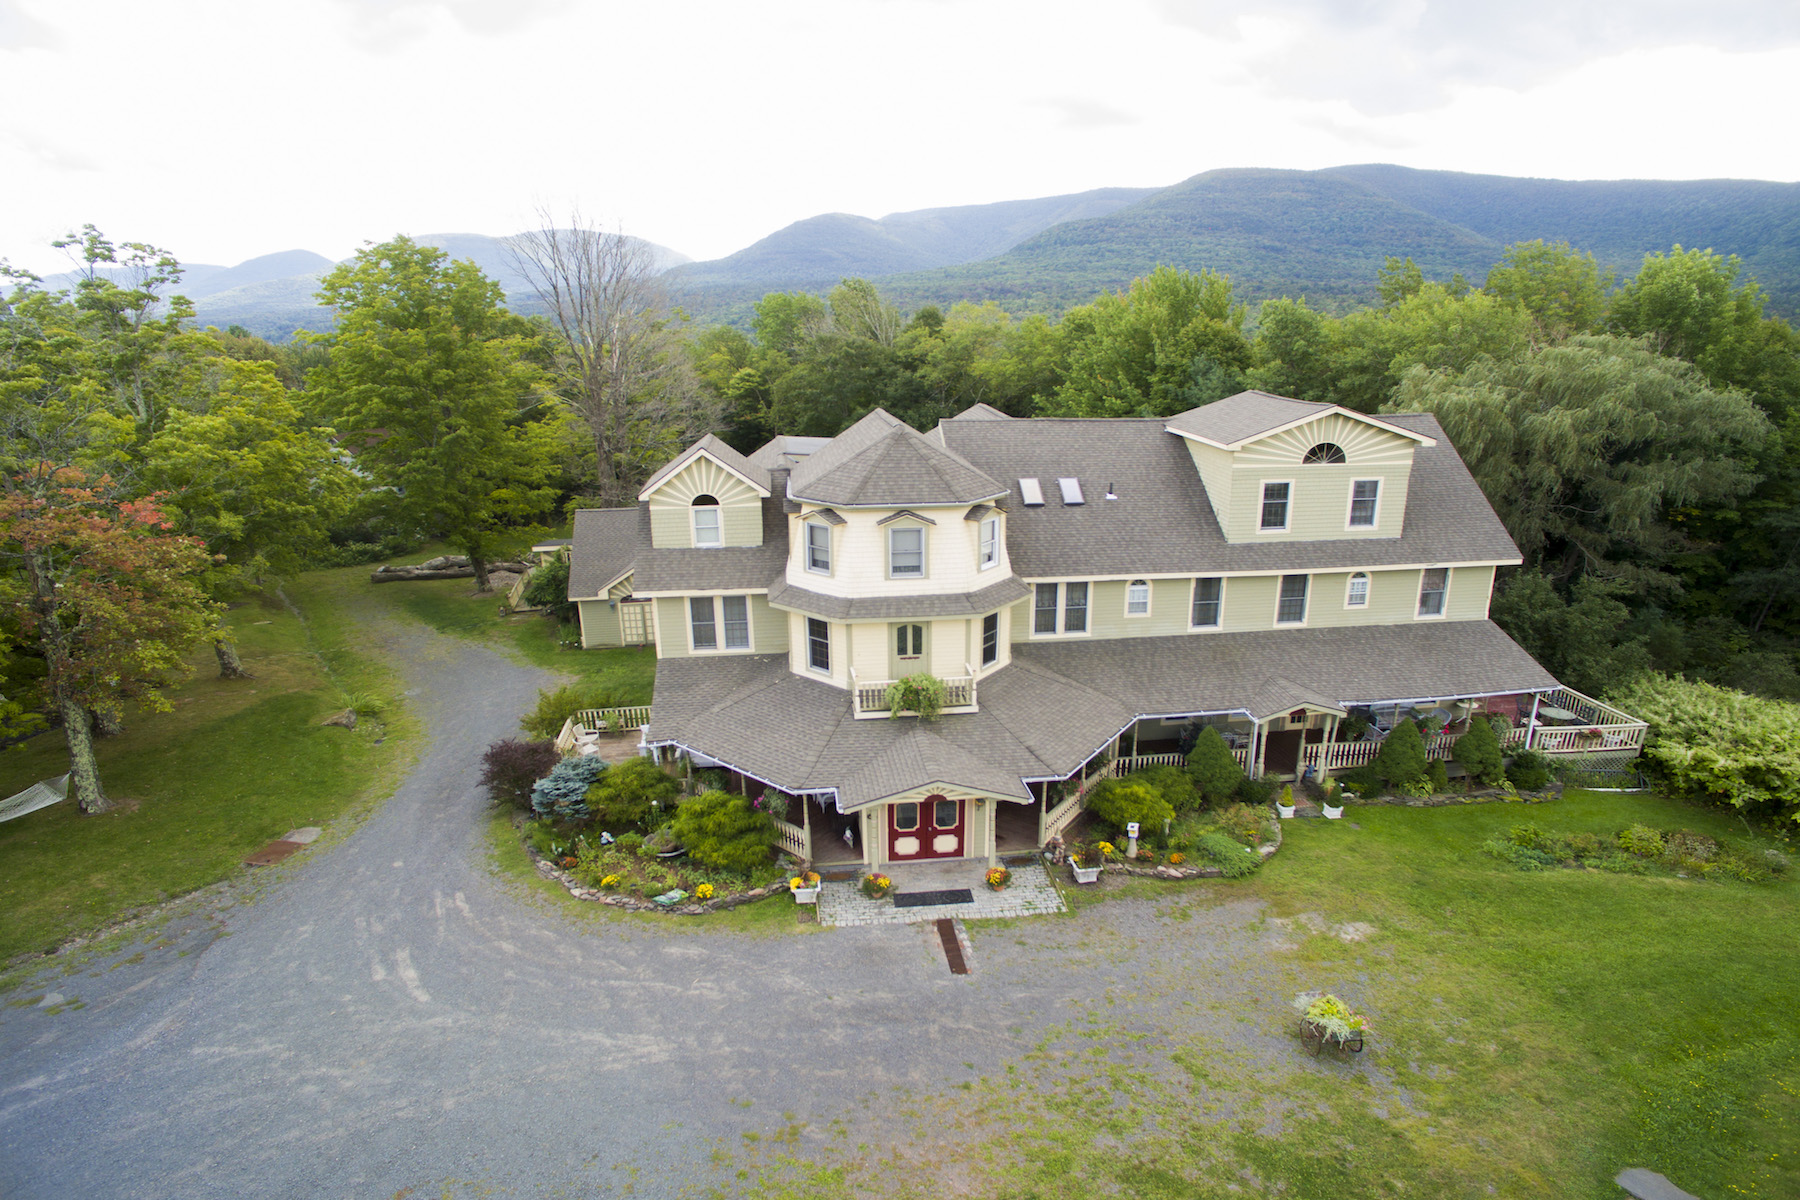 其它住宅 为 销售 在 Victorian Home on The Rip Van Winkle Trail 6629 Route 23A Tannersville, 纽约州 12442 美国